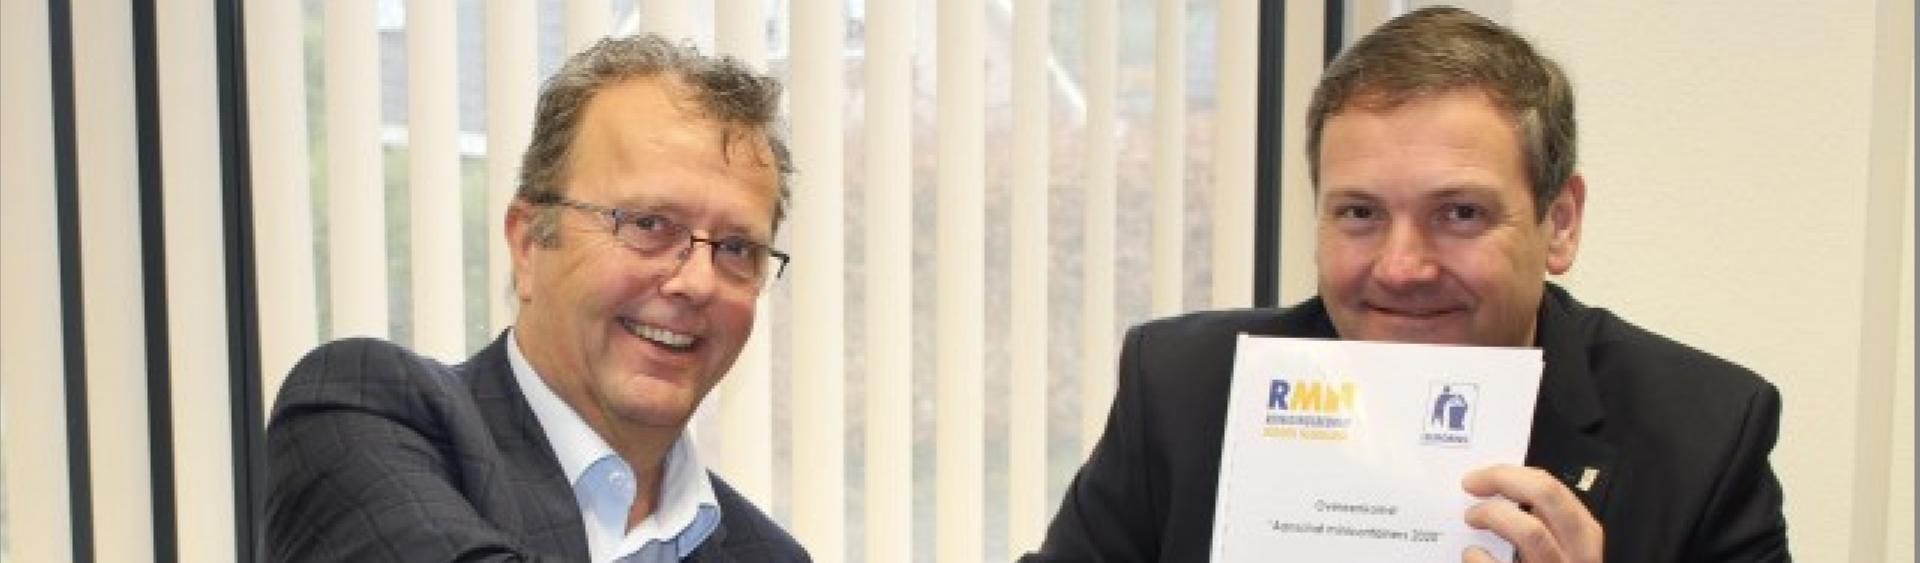 RMN haalt duurzame kliko's bij Eurobins